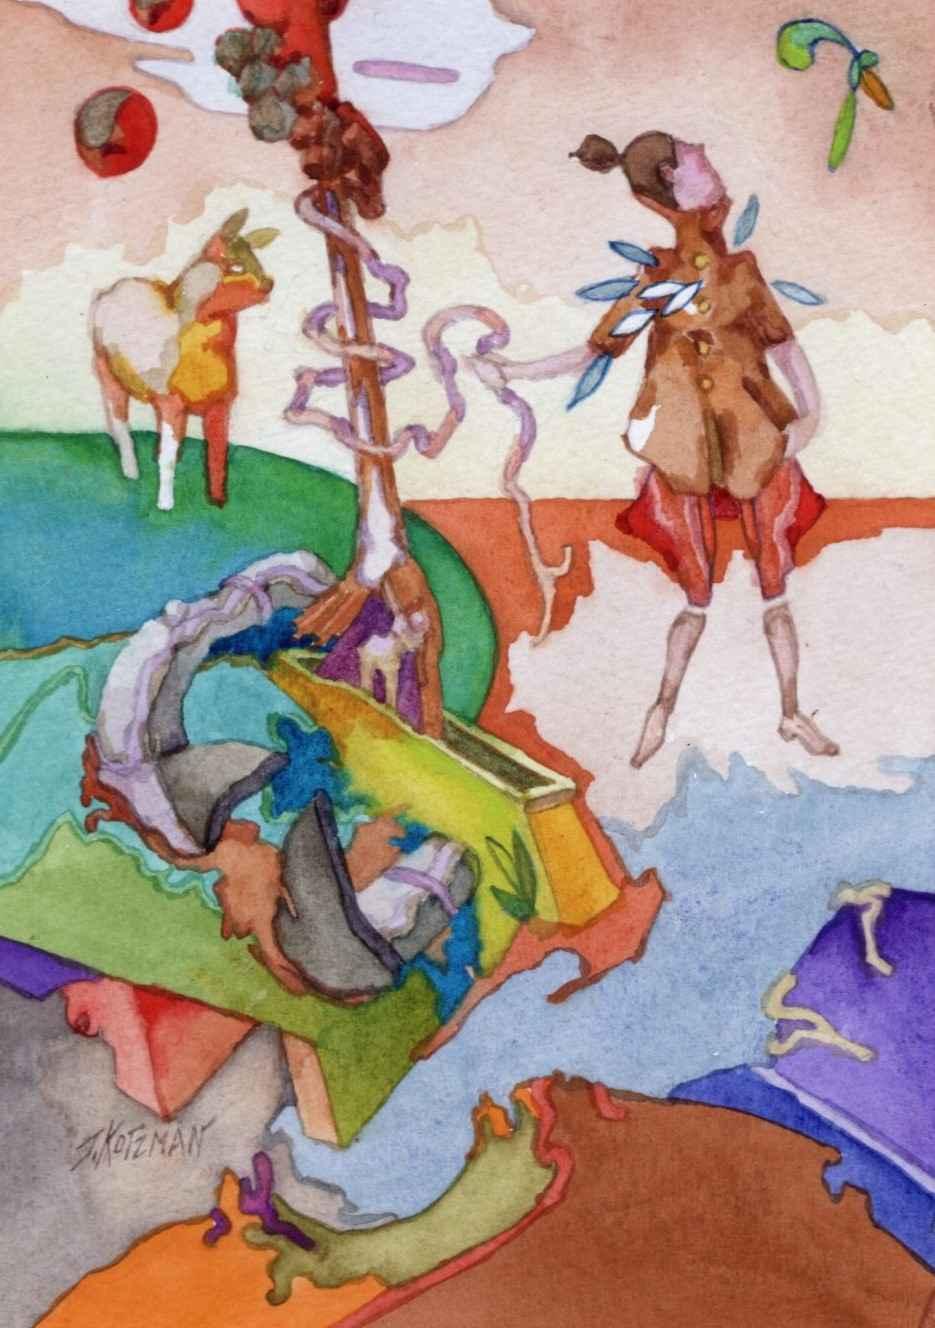 Pesky Boomerang by  Joe Kotzman - Masterpiece Online